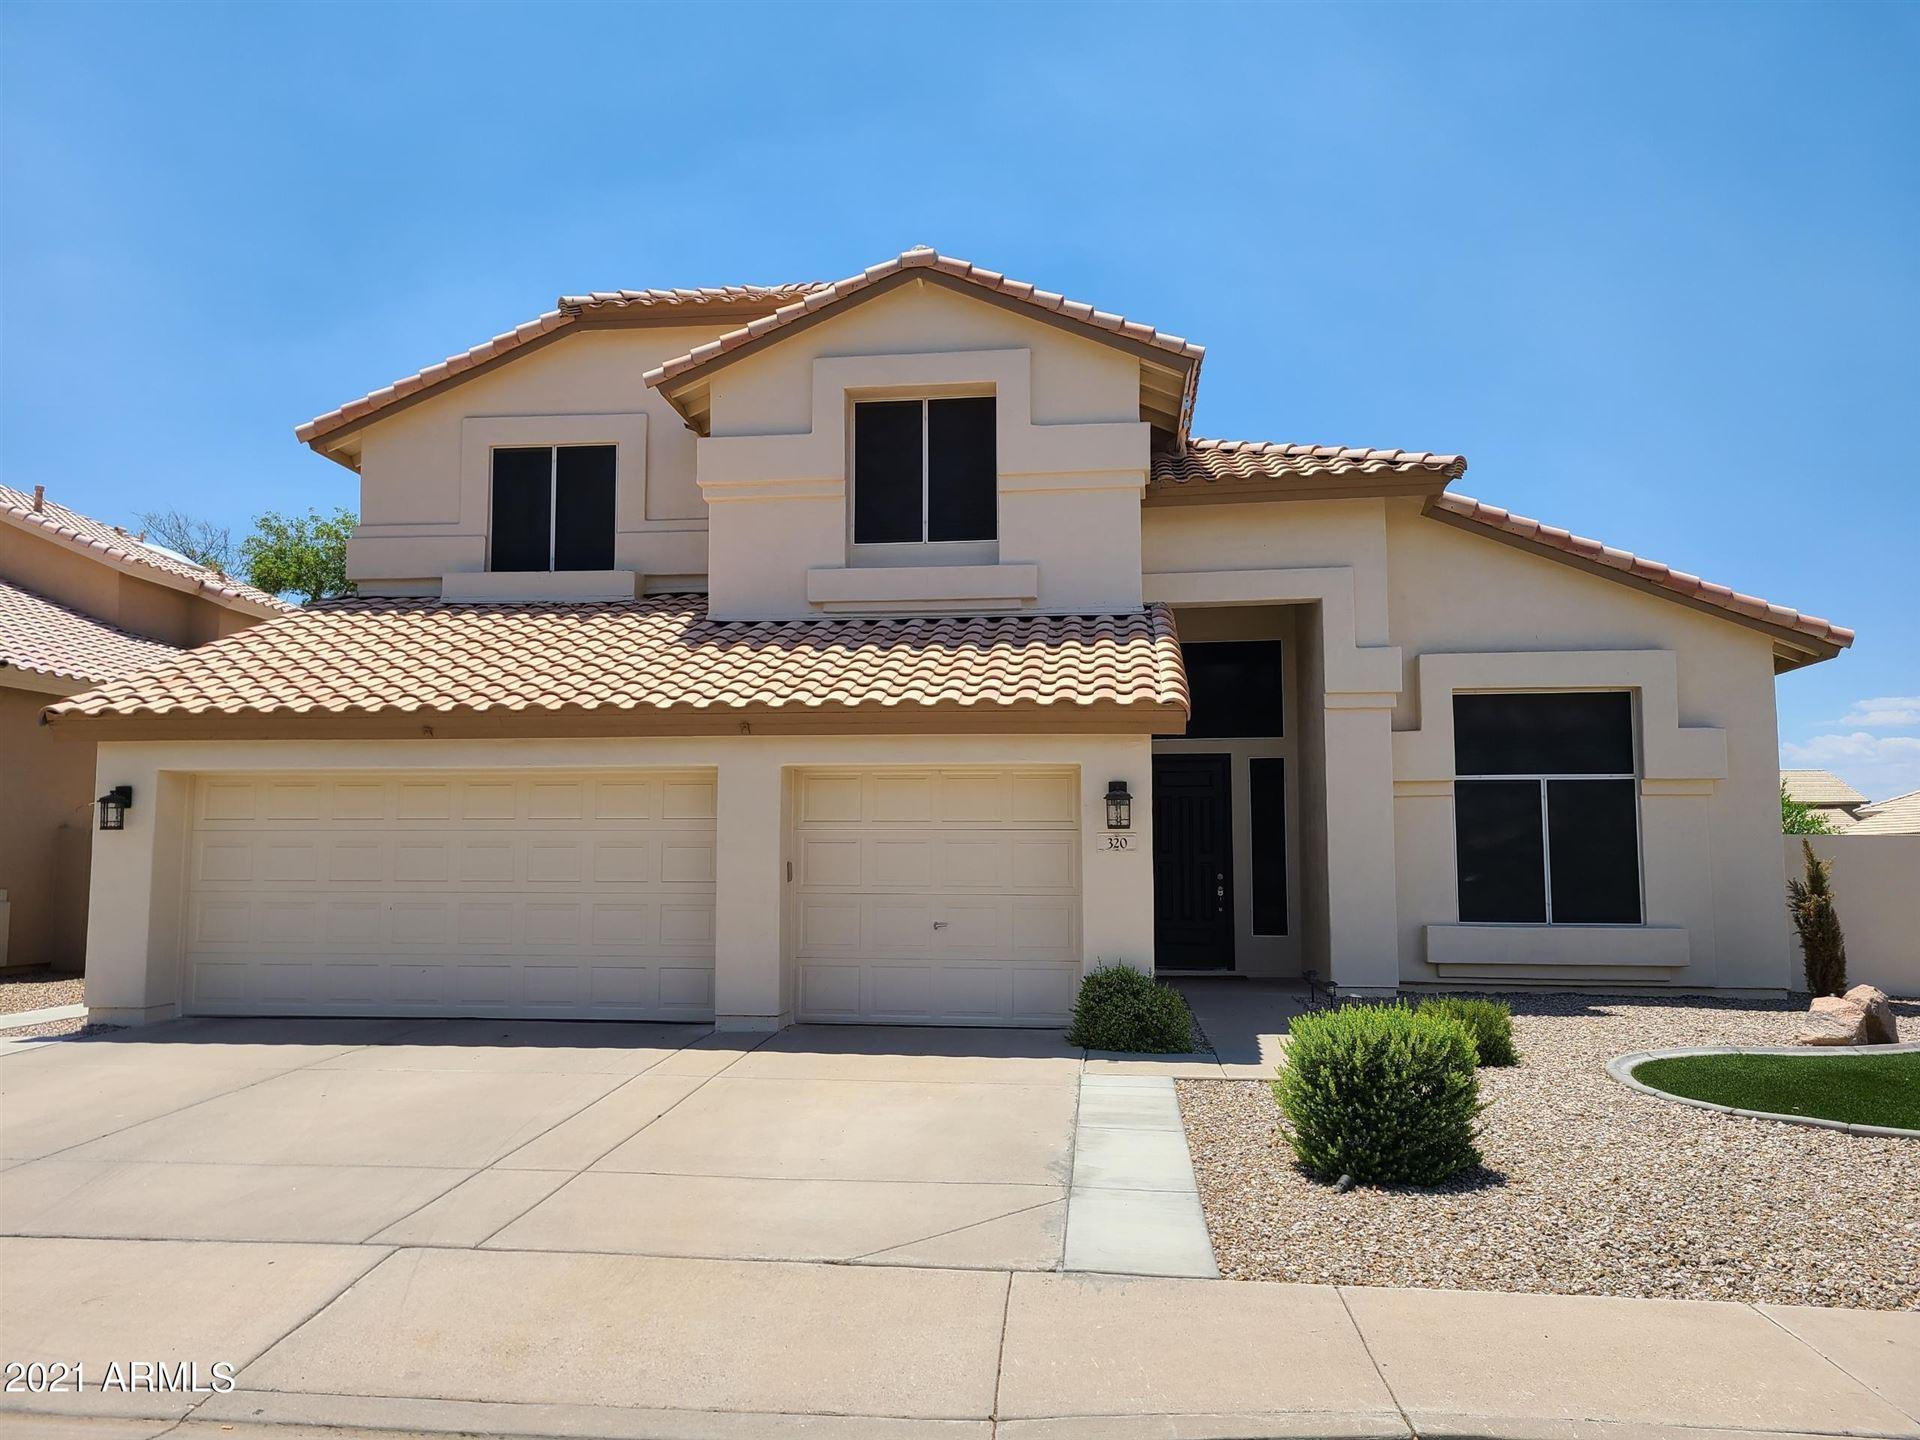 Photo of 320 N STANLEY Place, Chandler, AZ 85226 (MLS # 6265196)